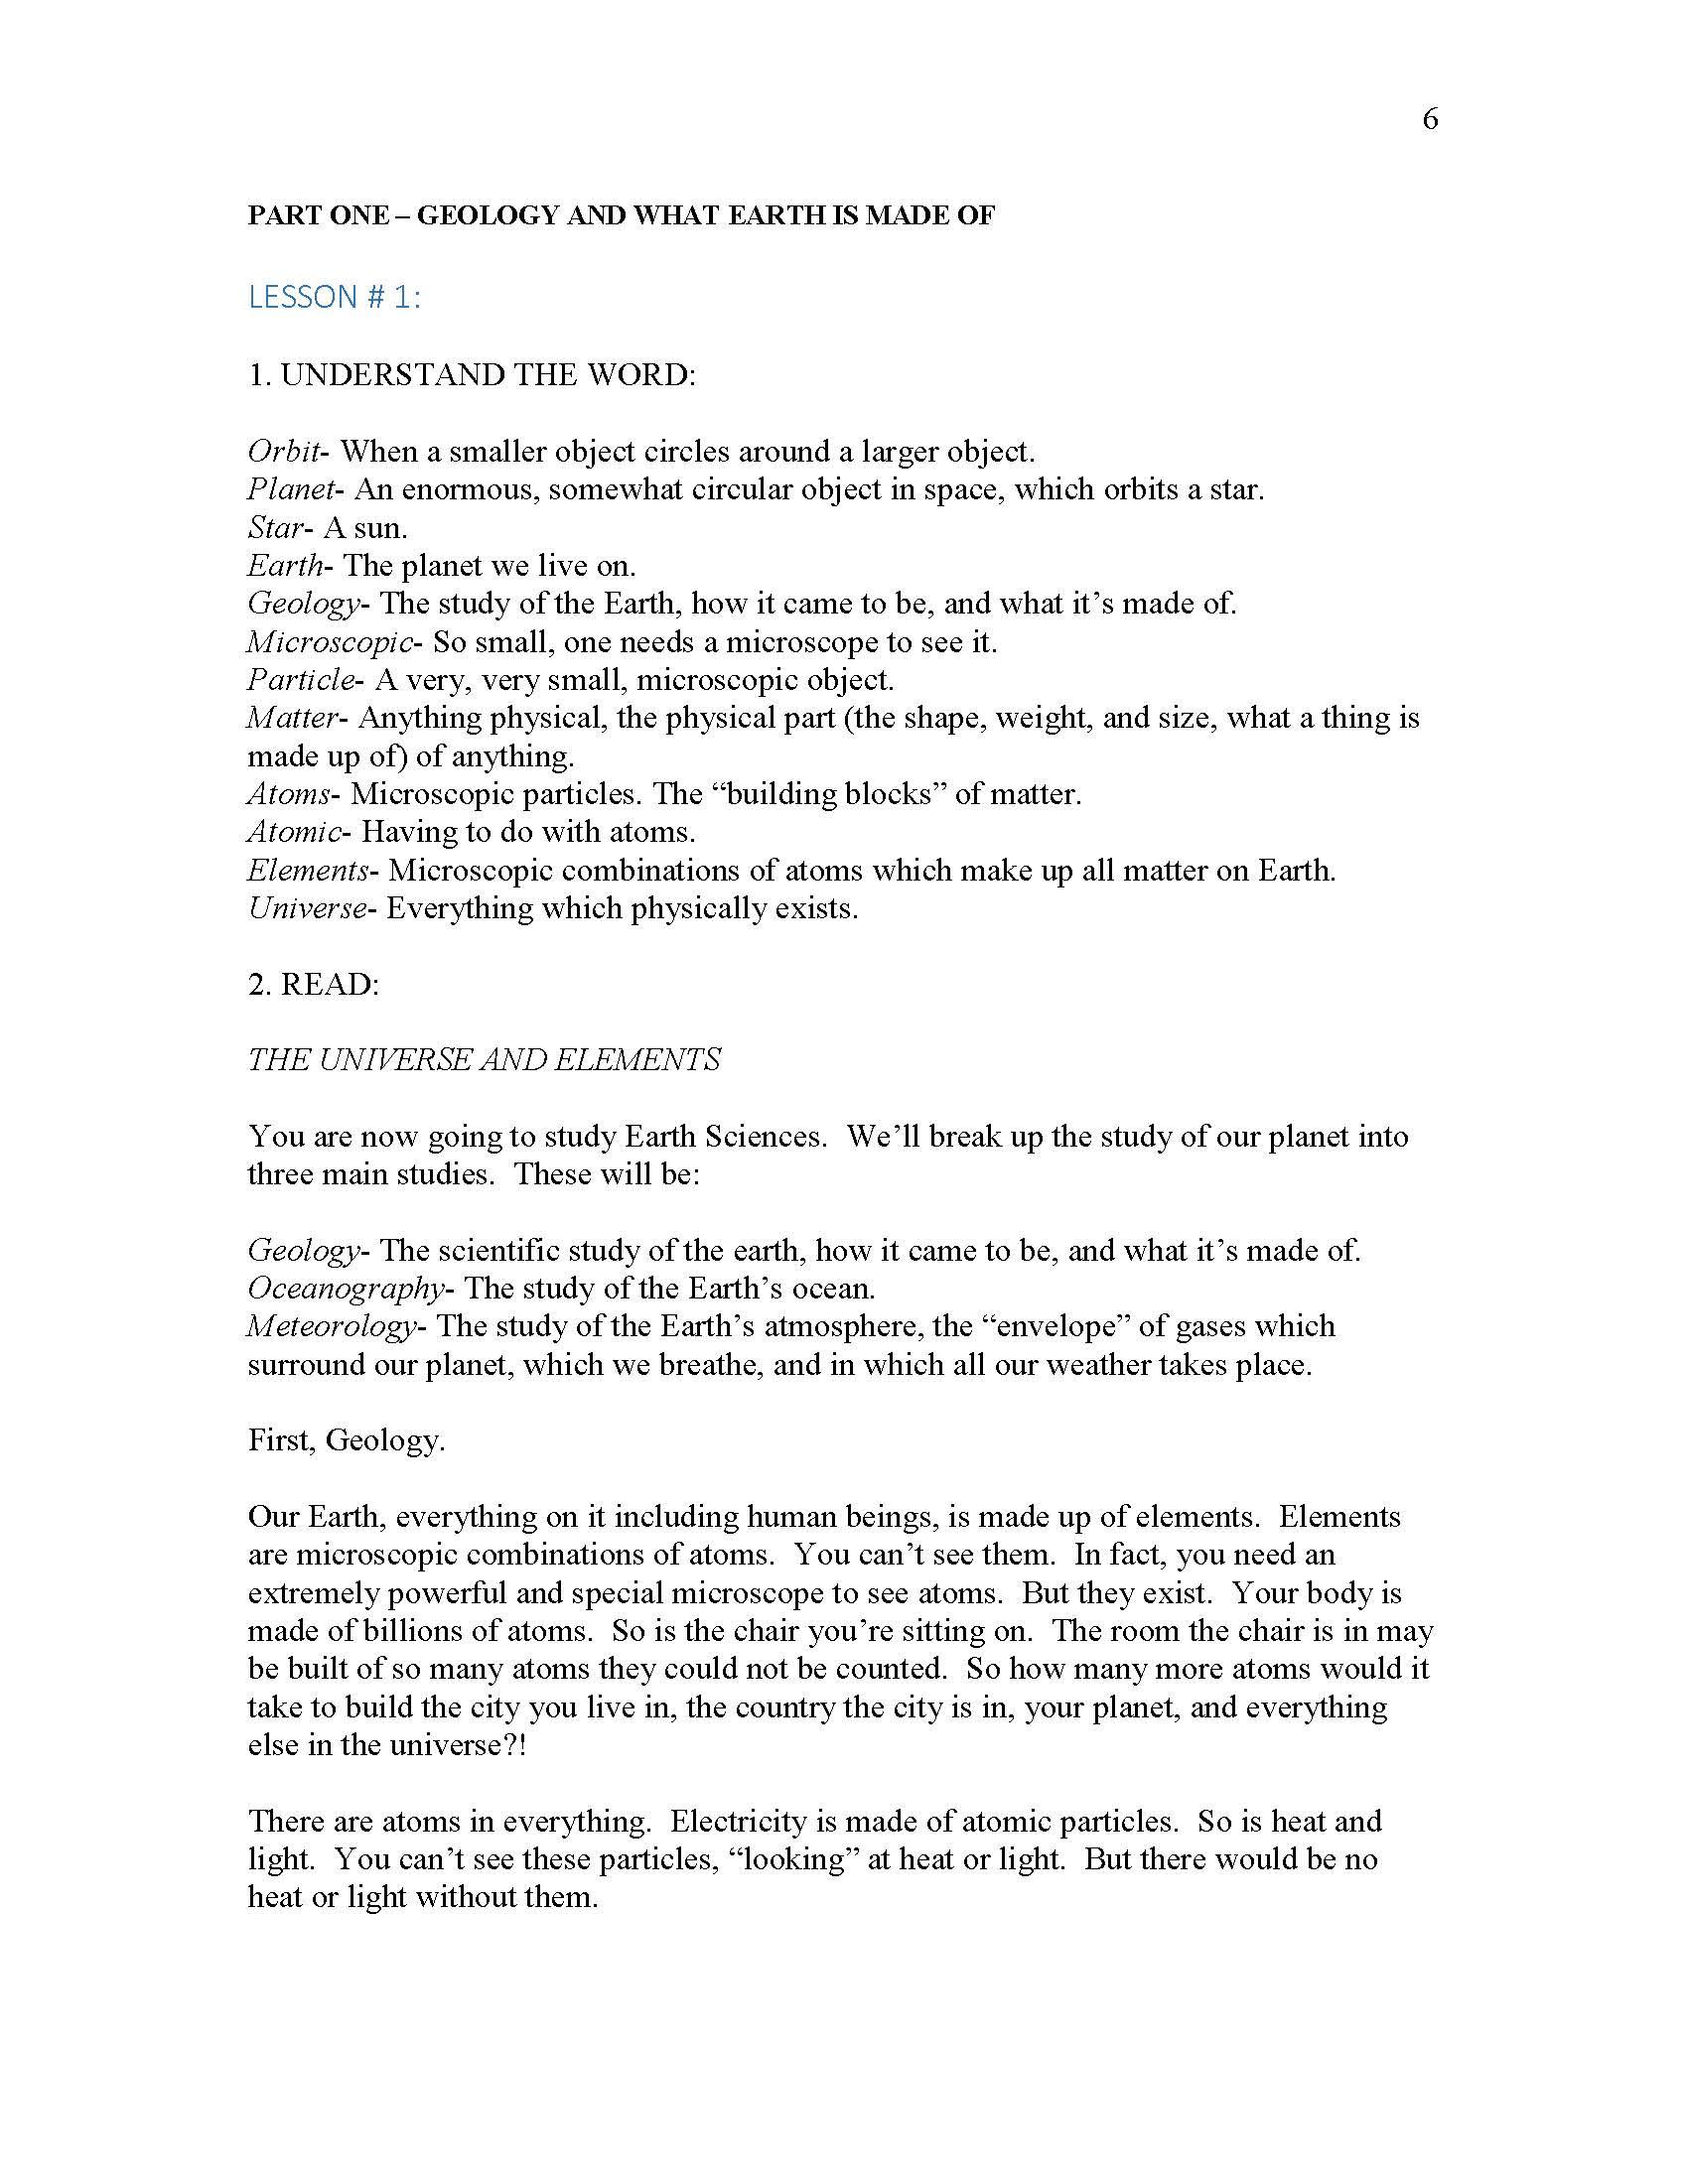 Step 3 Science 2 - Earth Sciences_Page_07.jpg